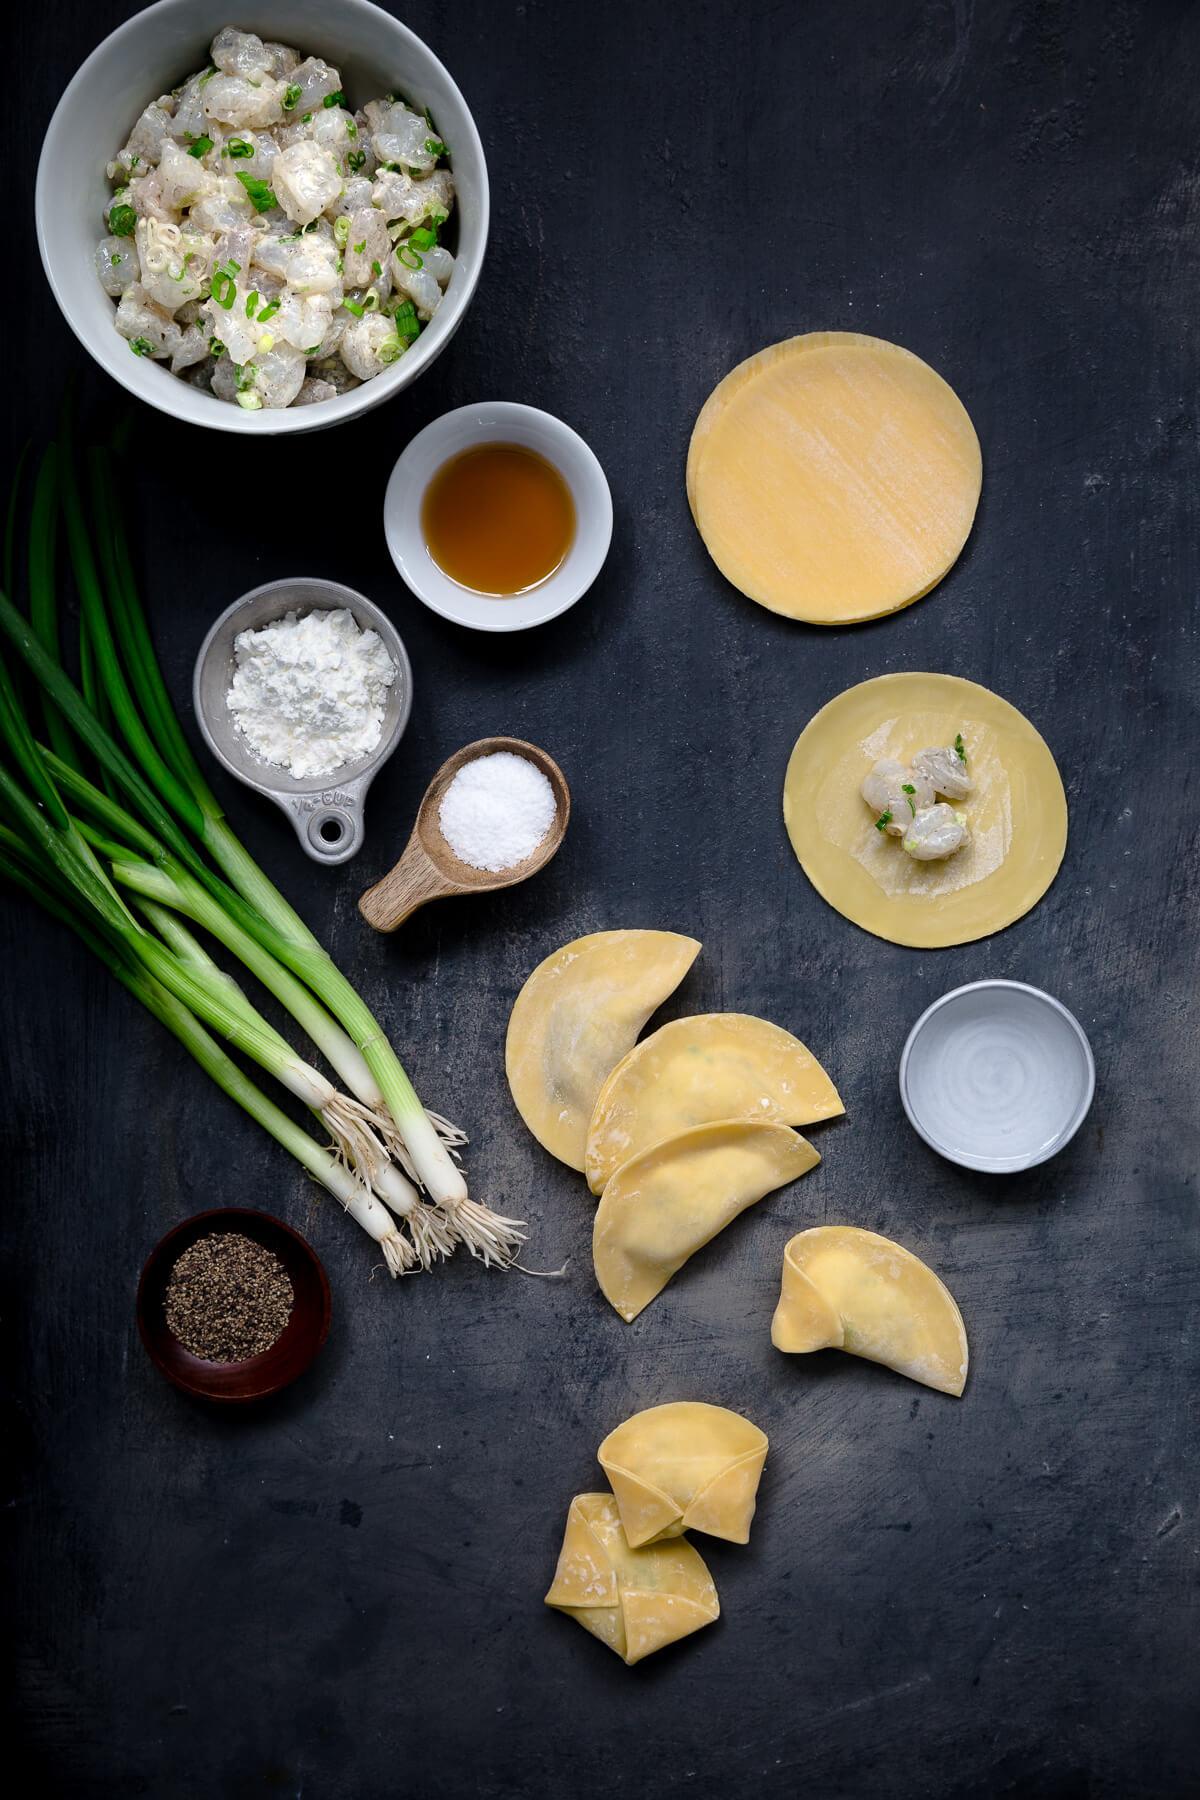 Ingredients for making shrimp dumplings set out on a dark gray board.